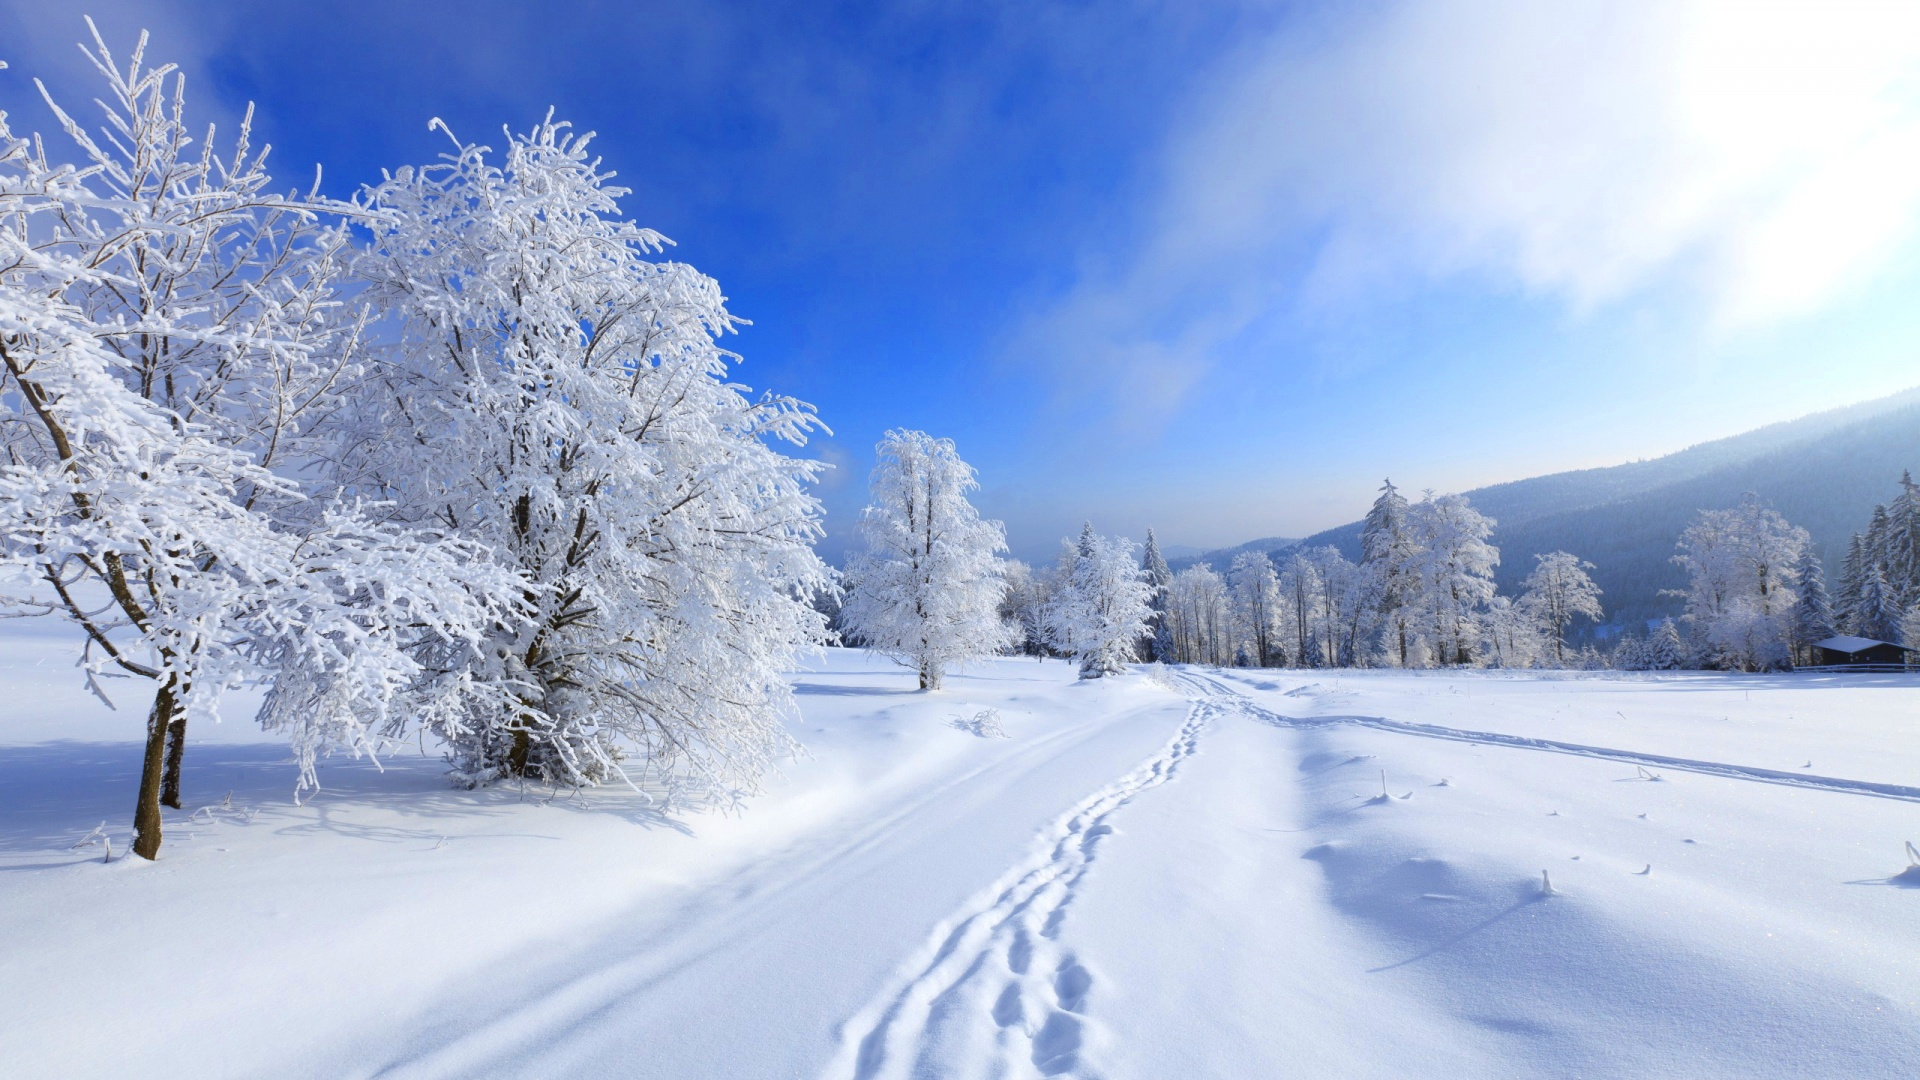 Winter High Definition 1920x1080 1920x1080